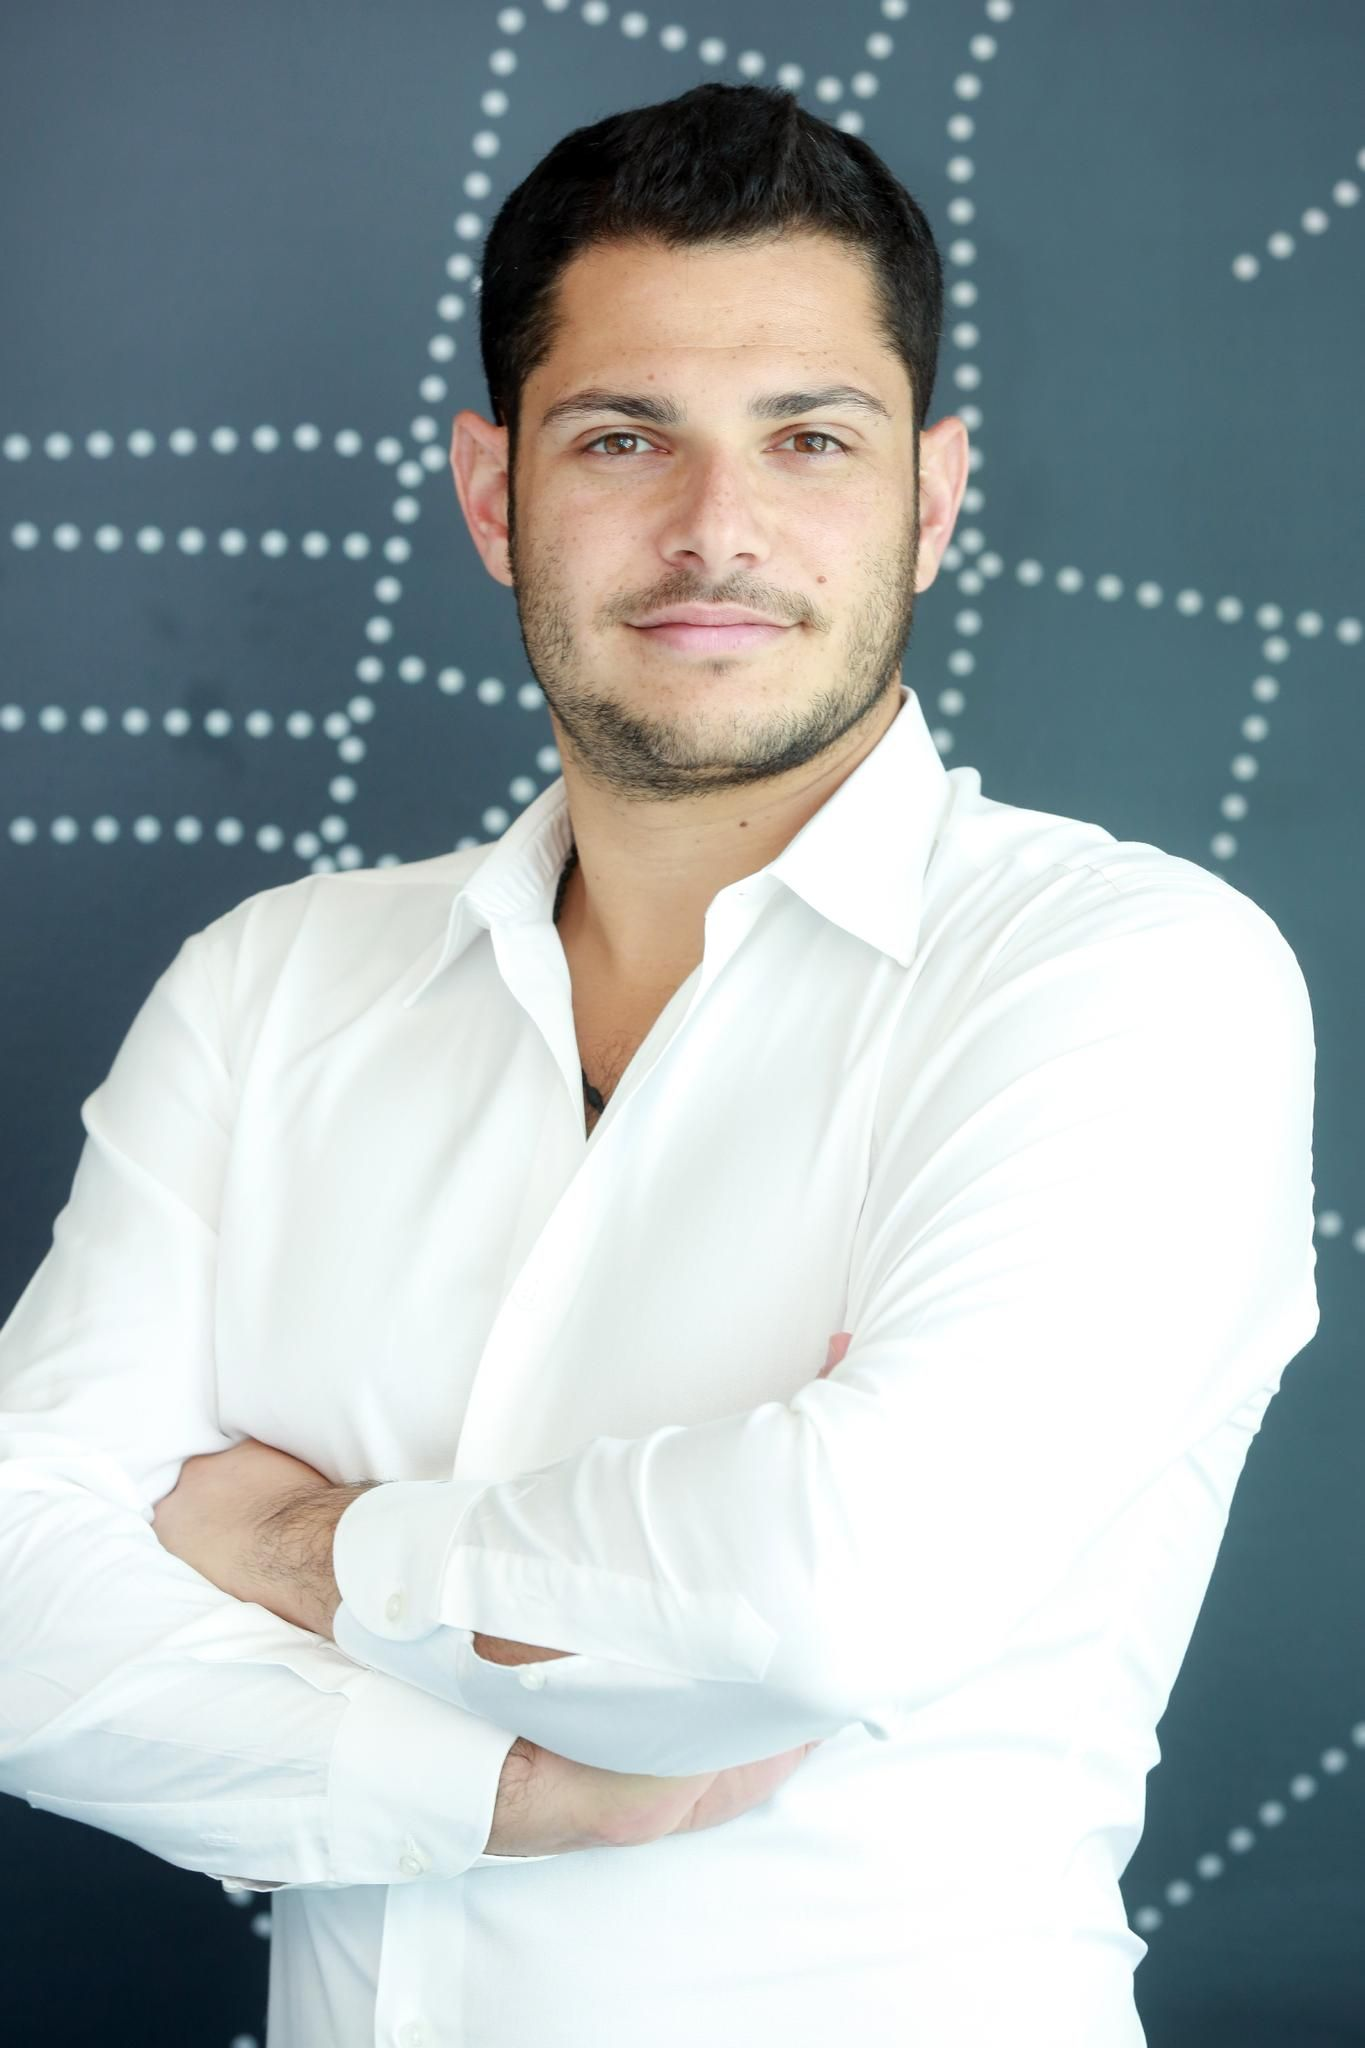 Anthony El-Khoury